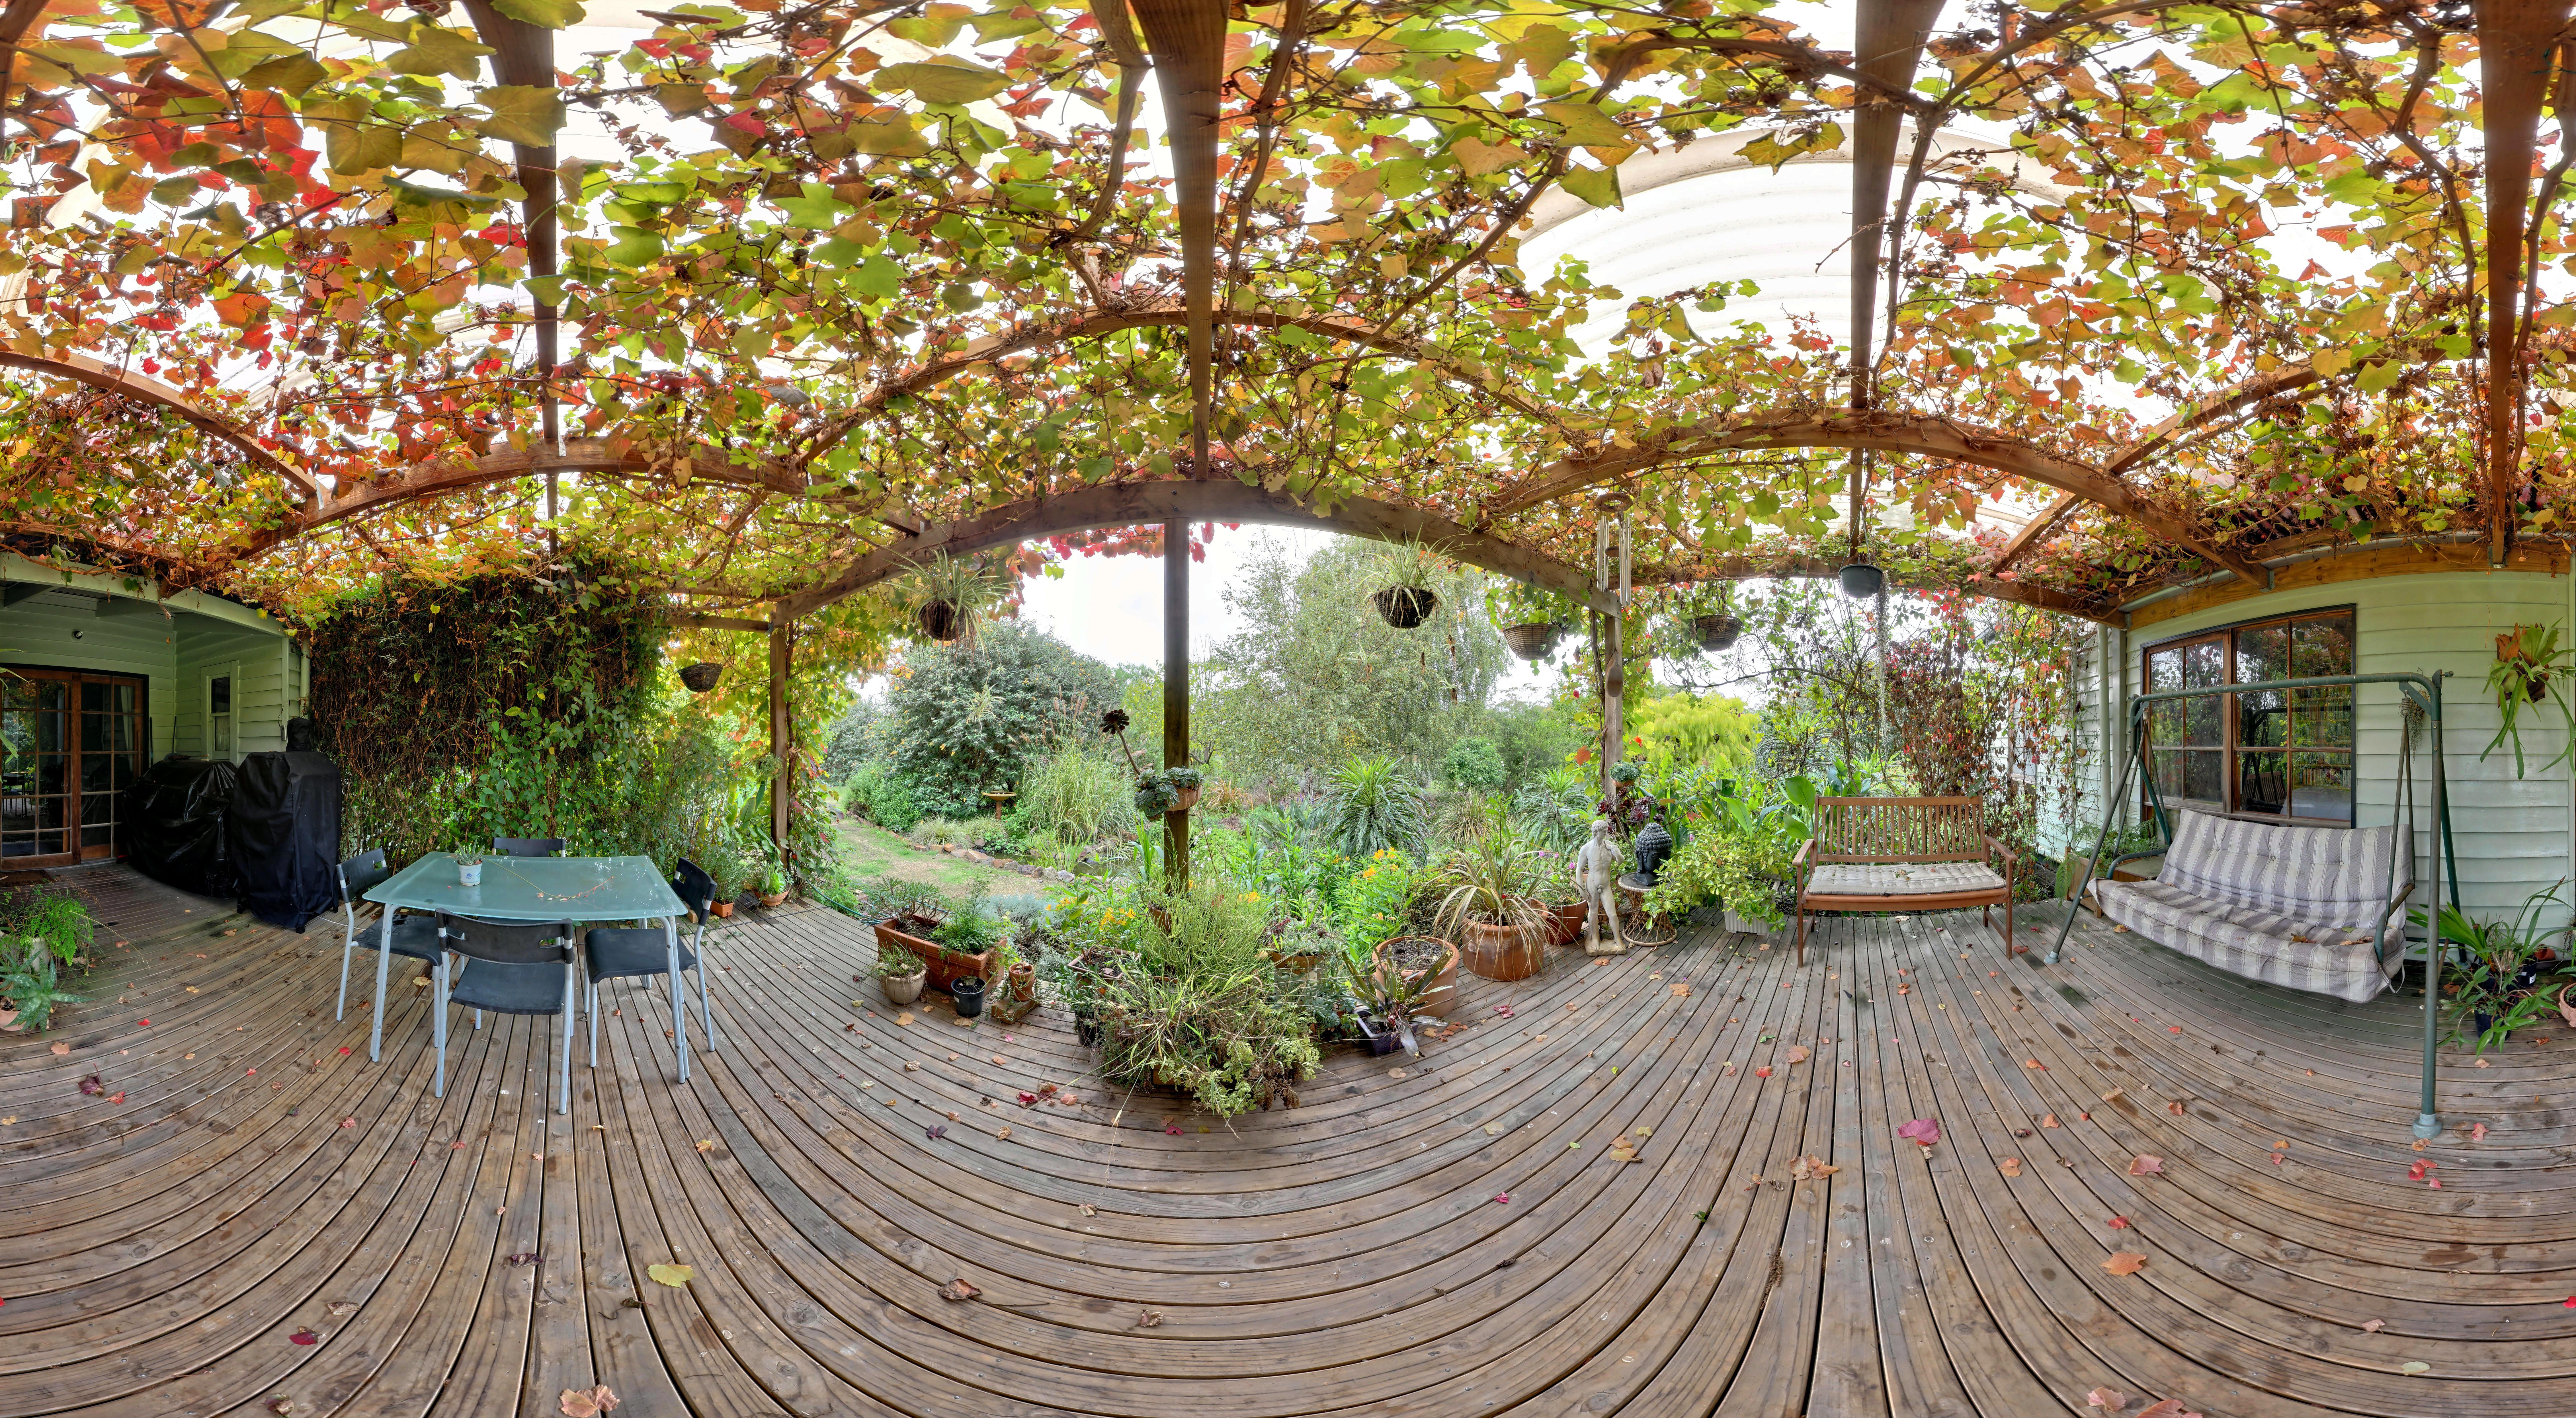 This should be verandah-centre.jpeg.  Is it missing?